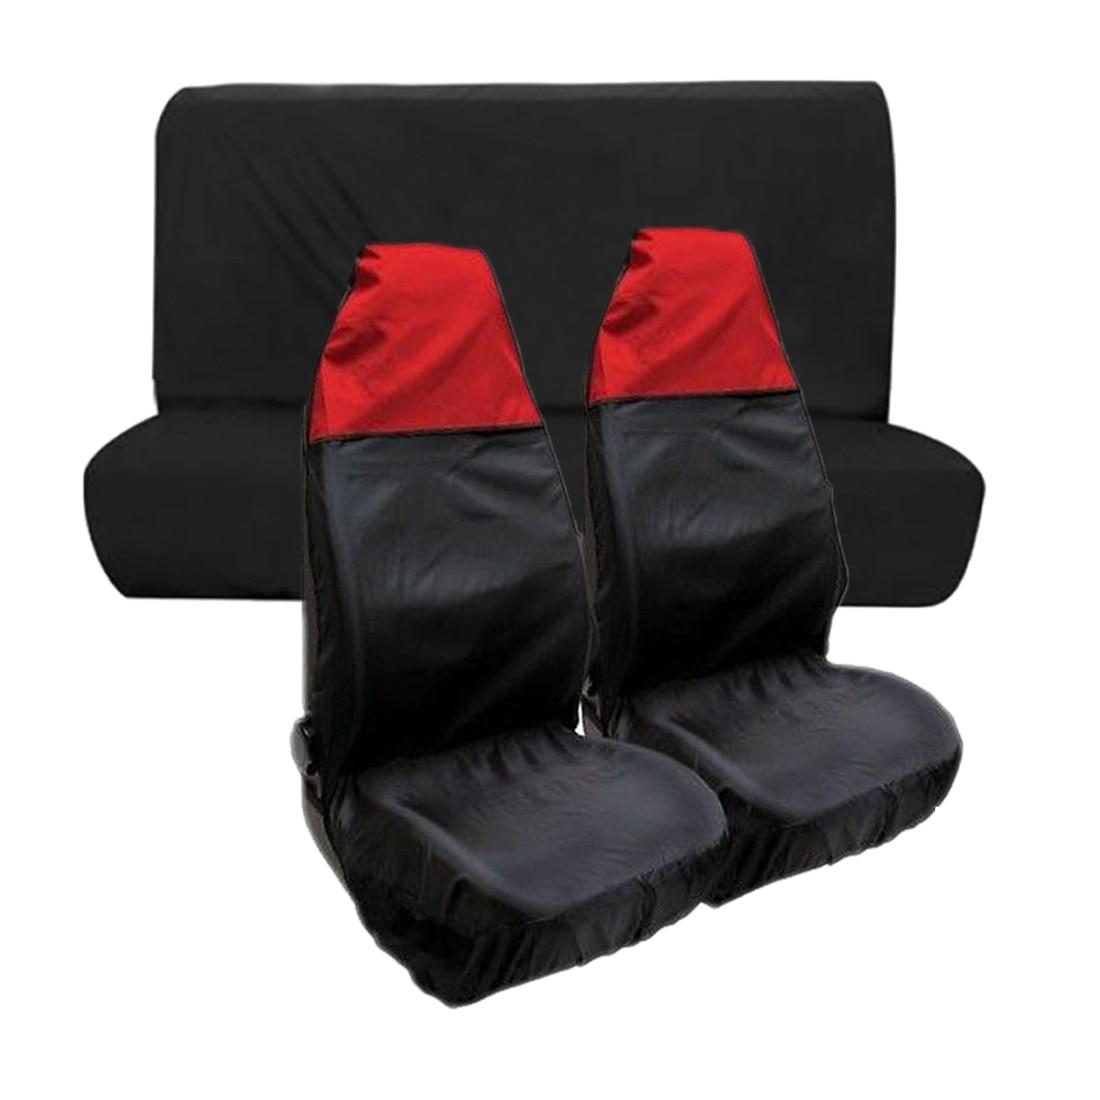 Suzuki Carry 2 x Fronts Heavy Duty Black Waterproof Seat Covers//Protectors